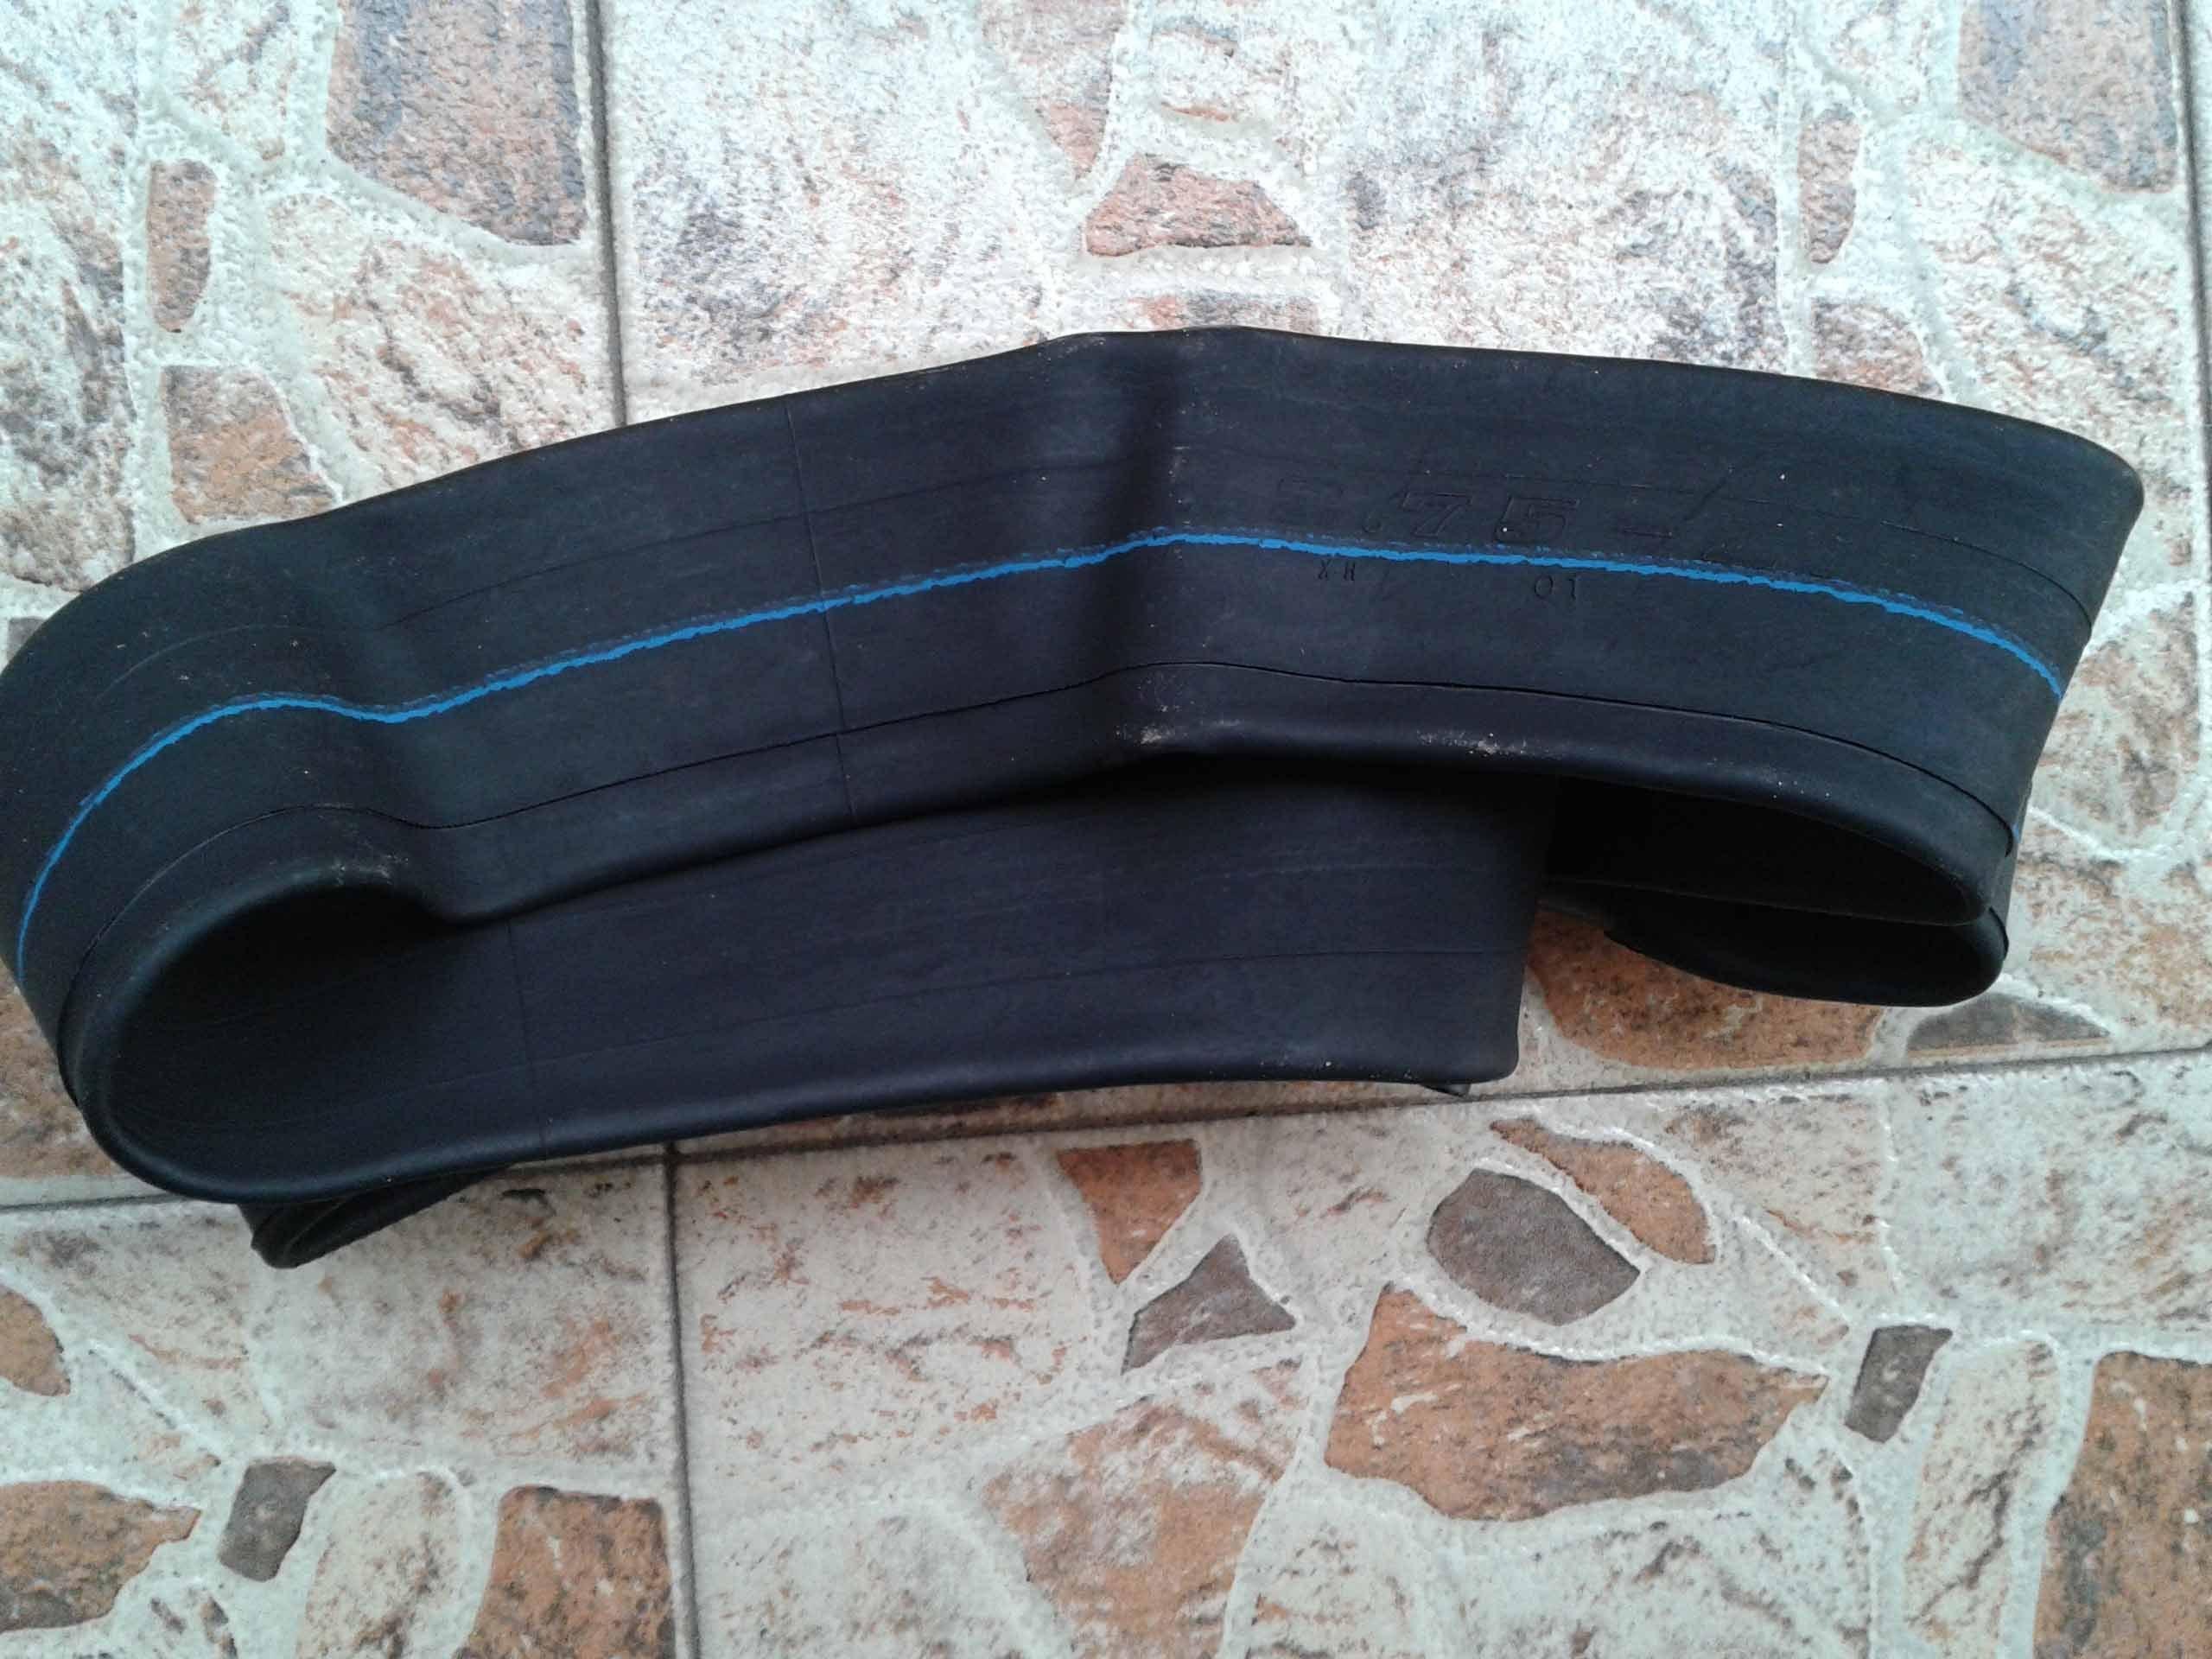 Off-road motorcycle tire tube 2.75 - 21 belt Wholesale versatility(China (Mainland))